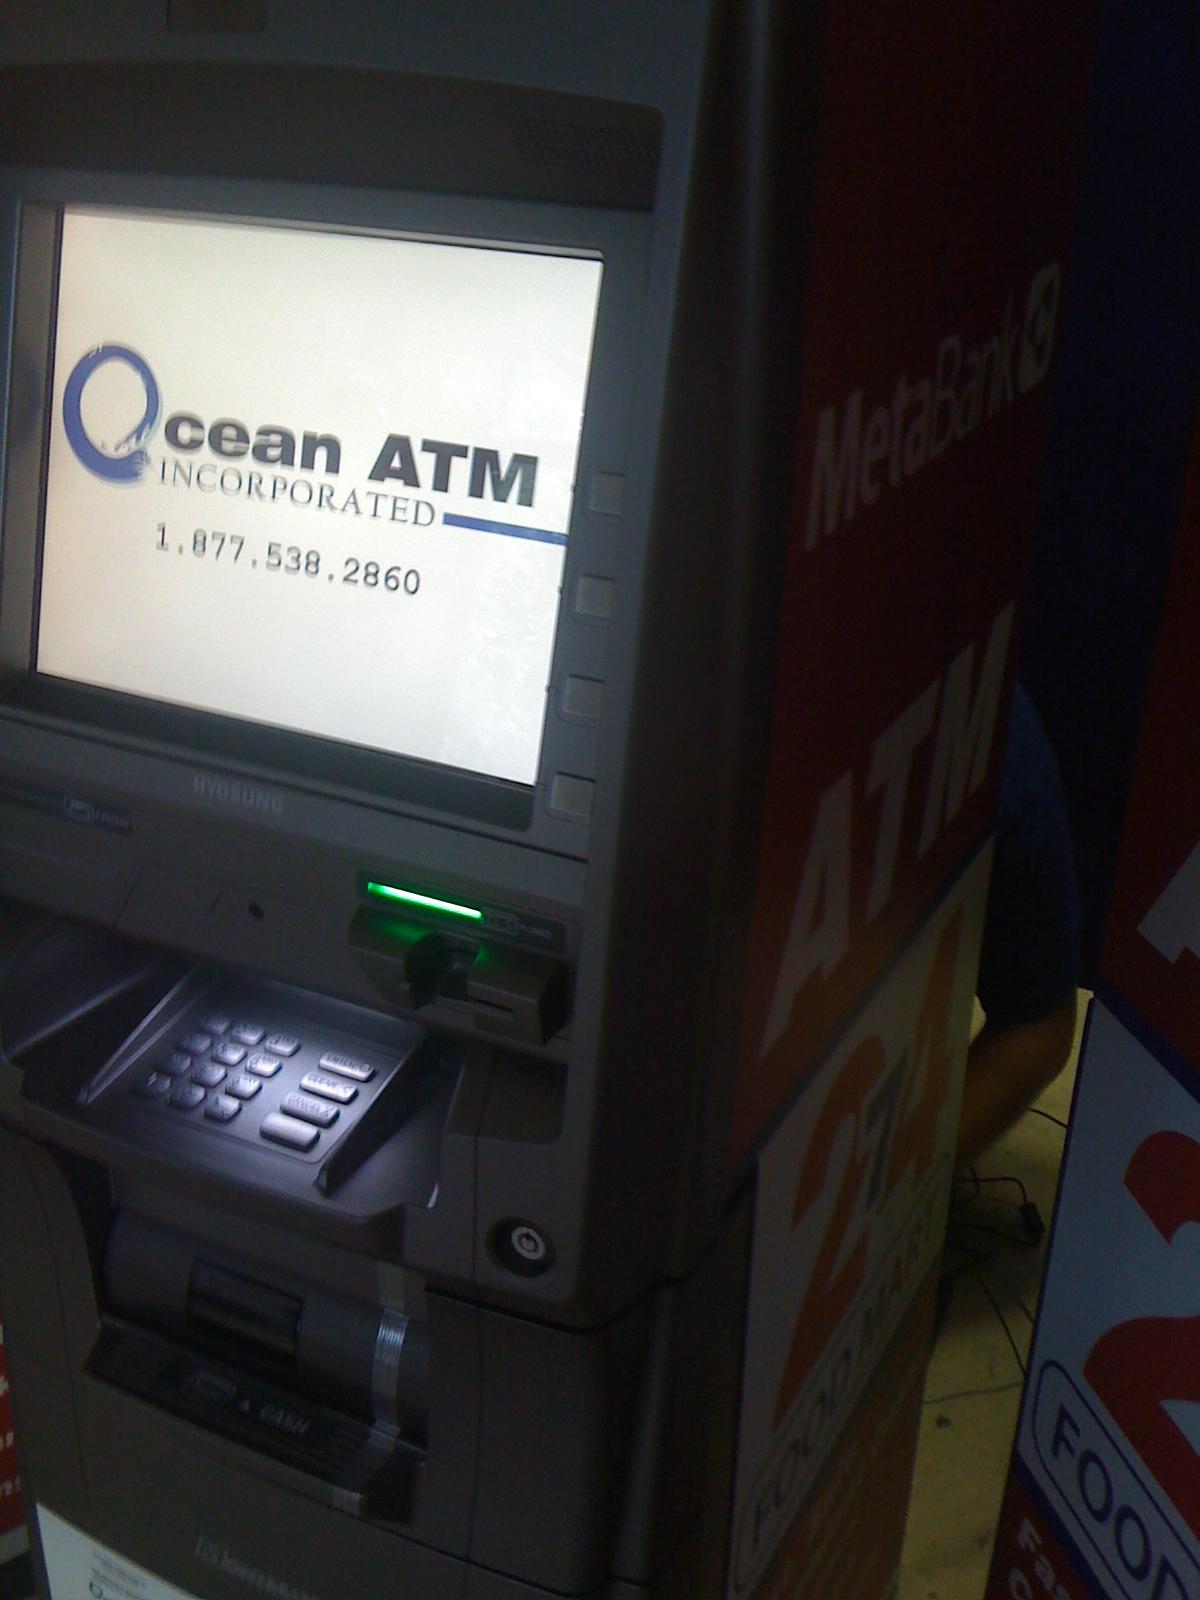 Ocean ATM Incorporated